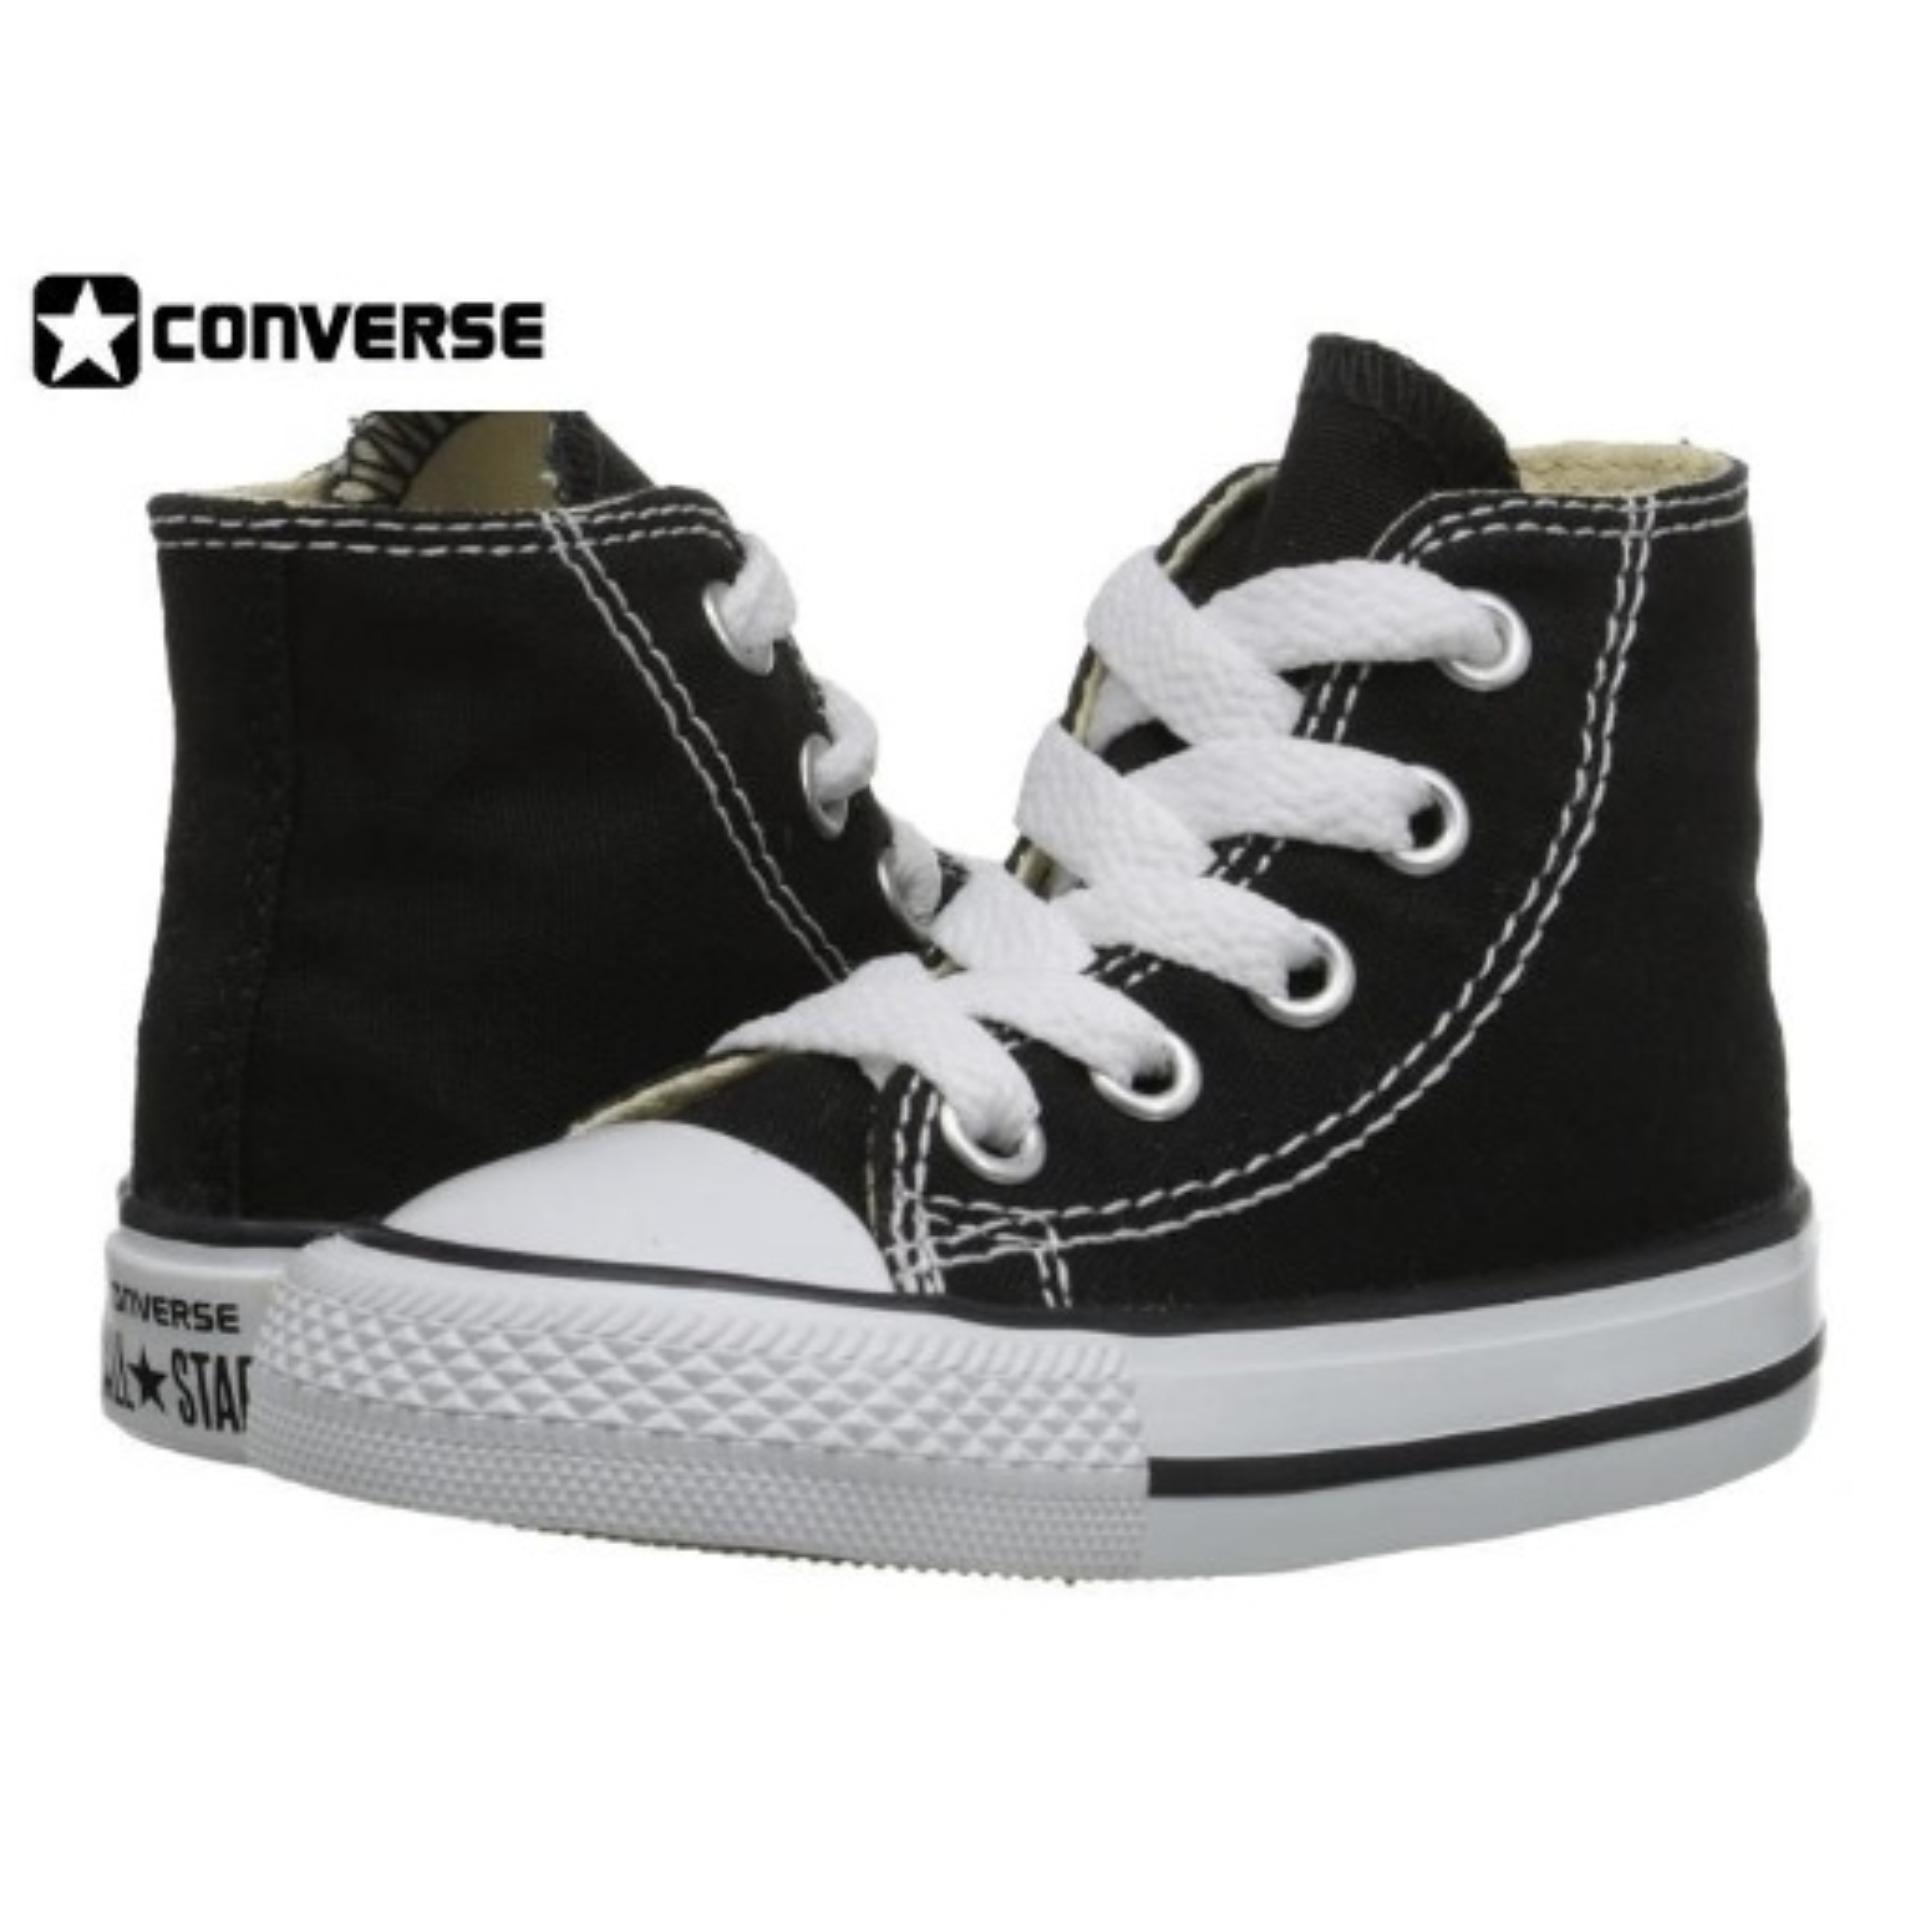 f82b306e0b10f Converse High Cut Shoes for MEN